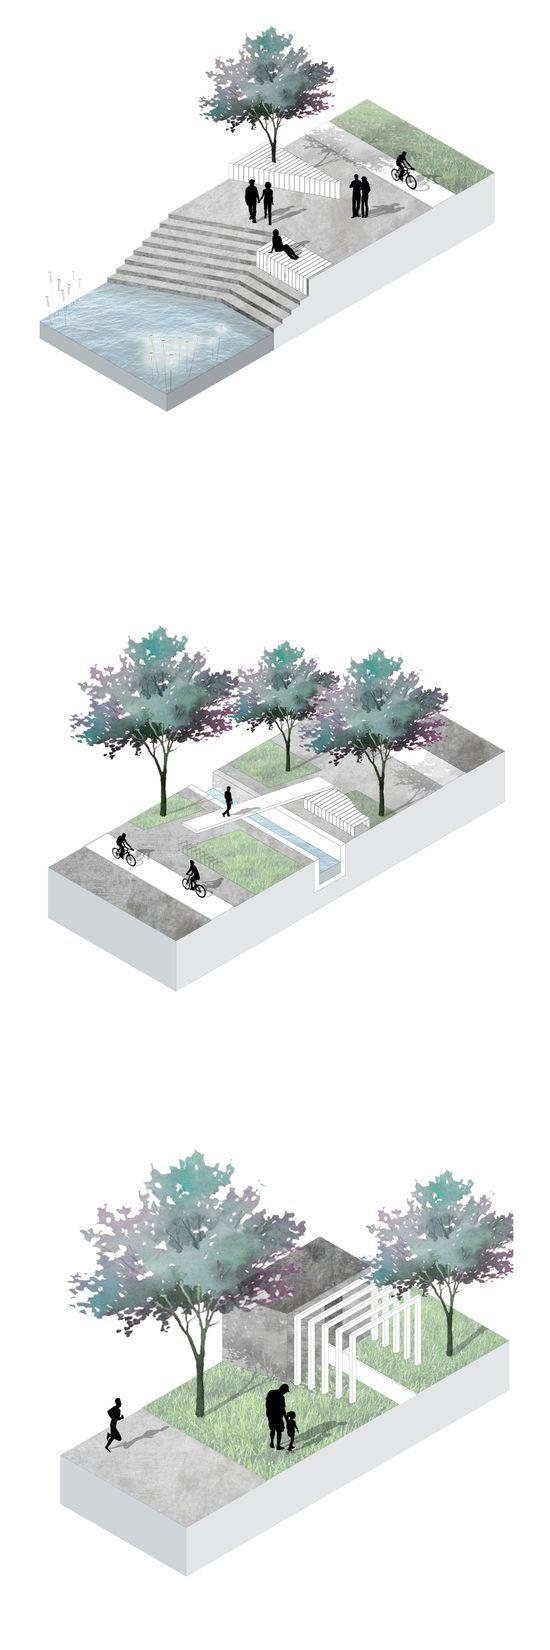 Architektur Schnitt digital art apps for pc Digital Art